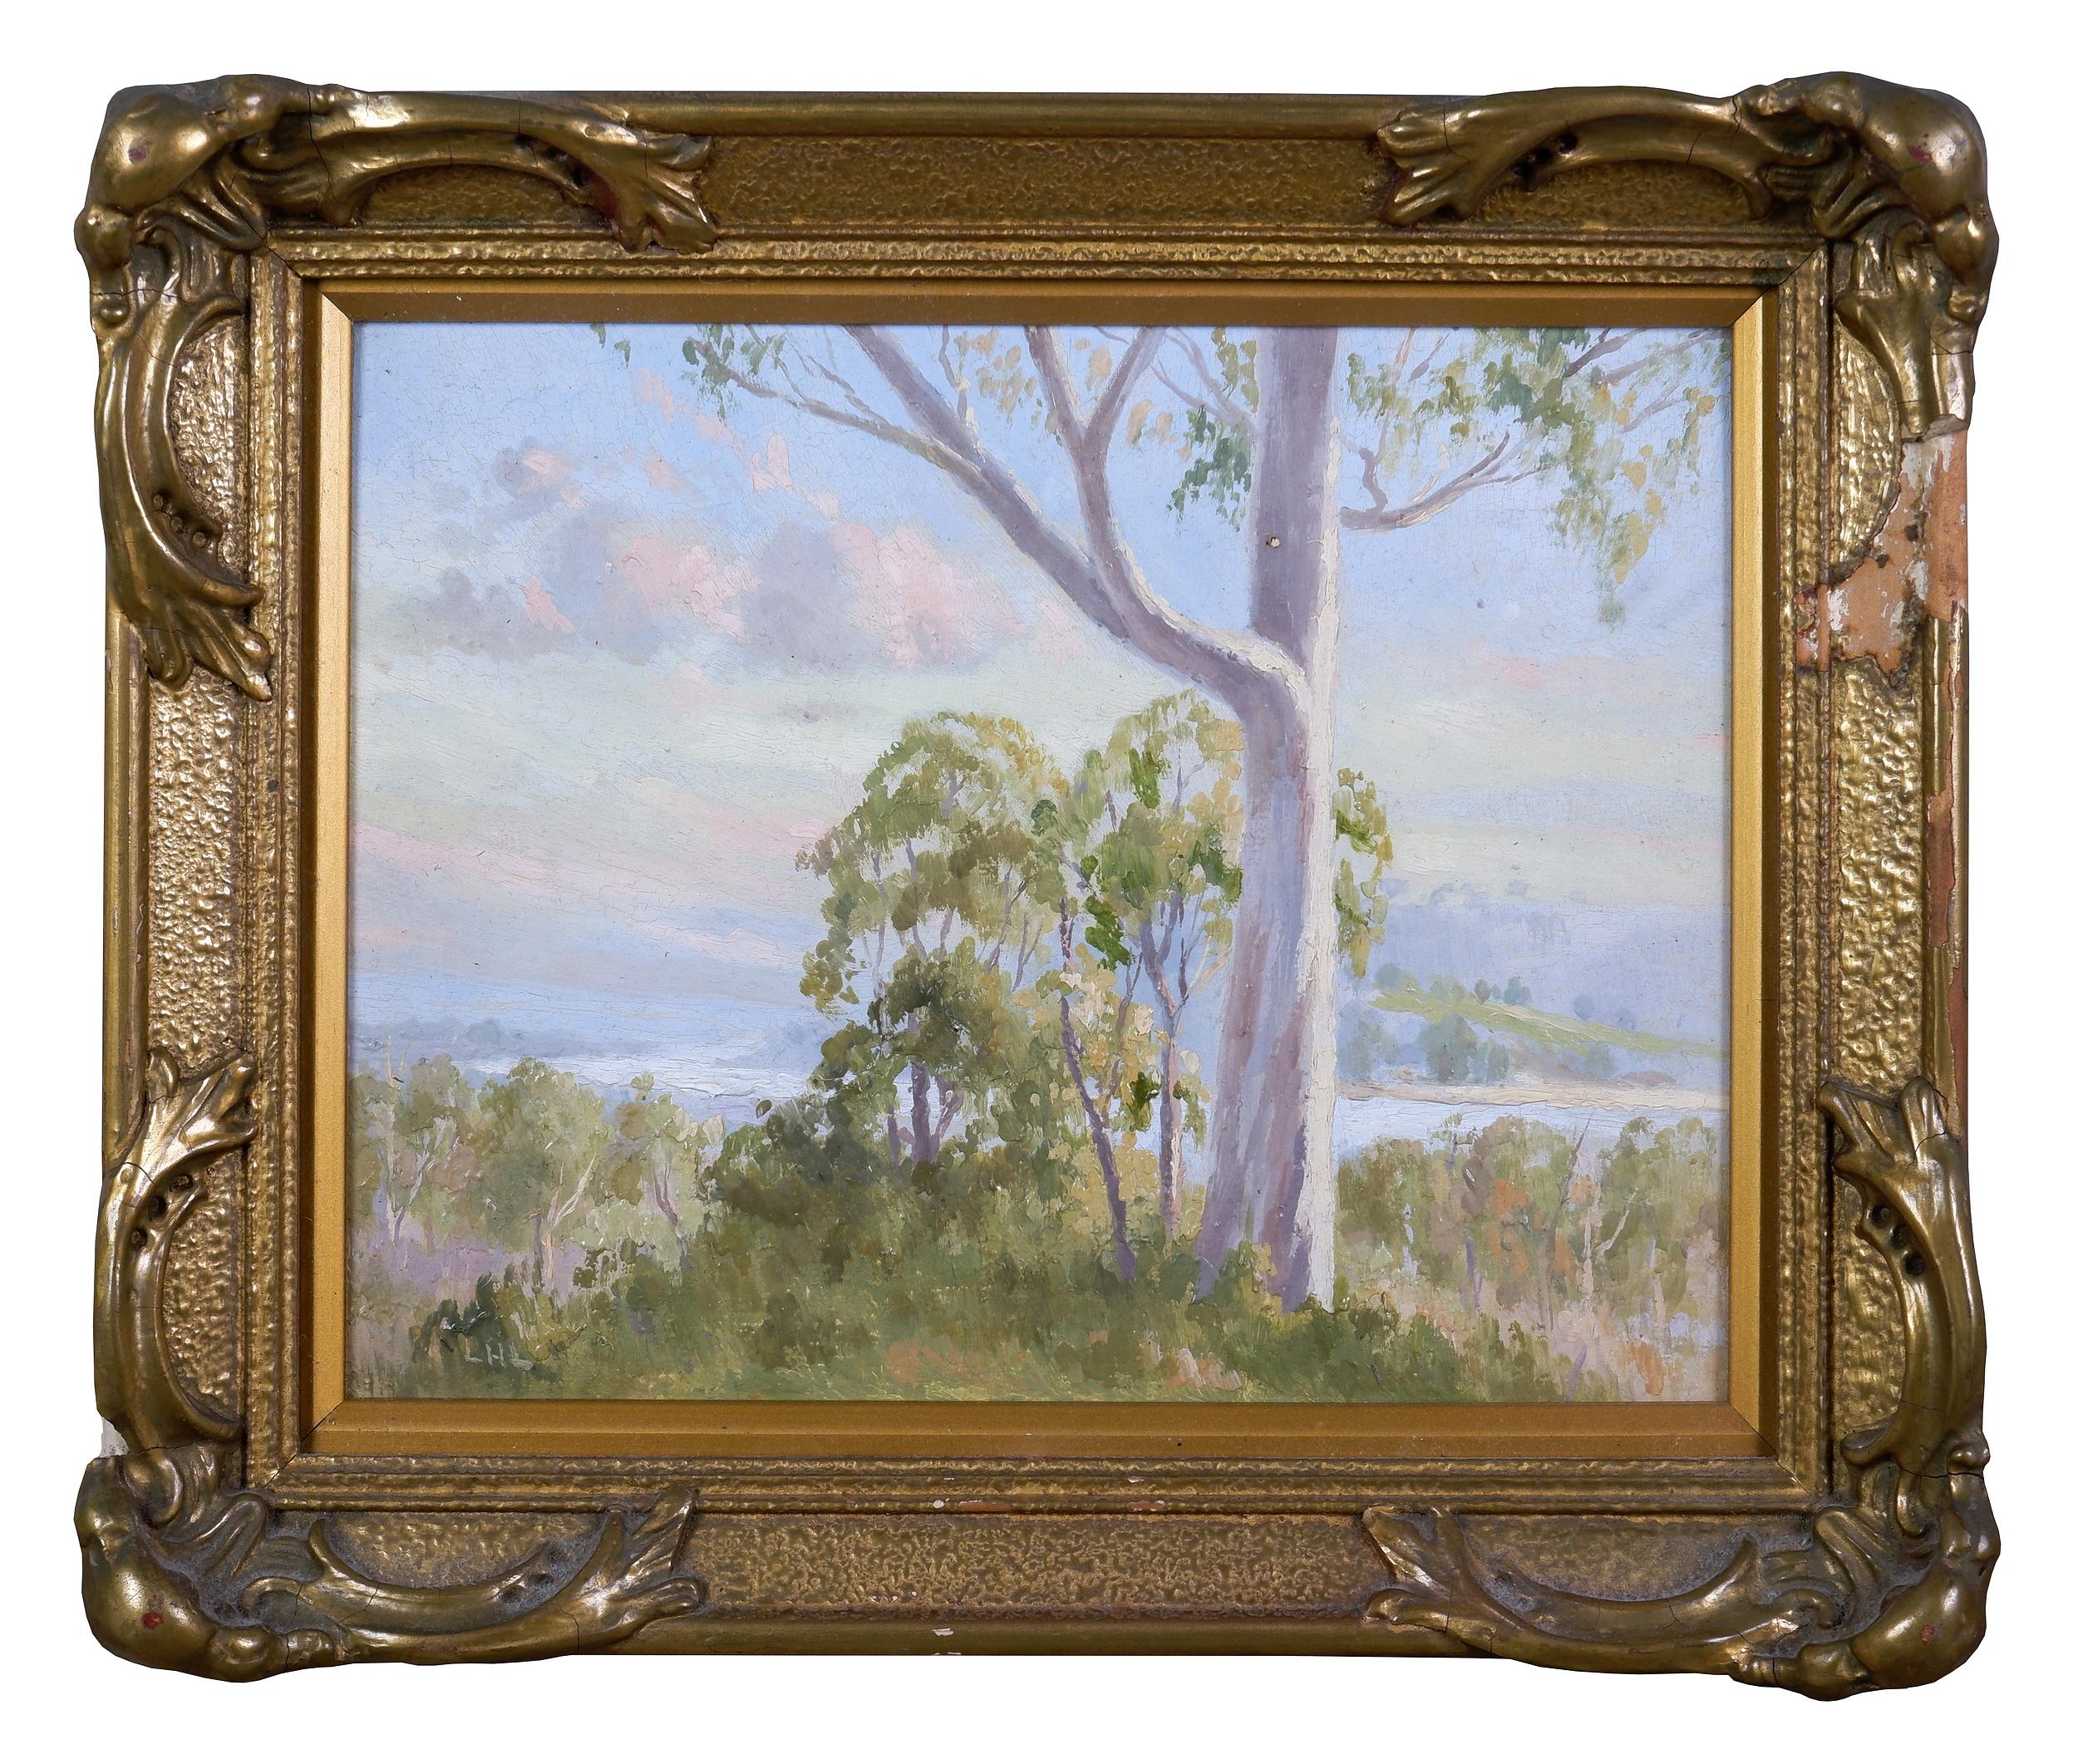 'Leonard Long (1911-2013), Summer Hill, New South Wales, Oil on Board, 18.5 x 22.5 cm'